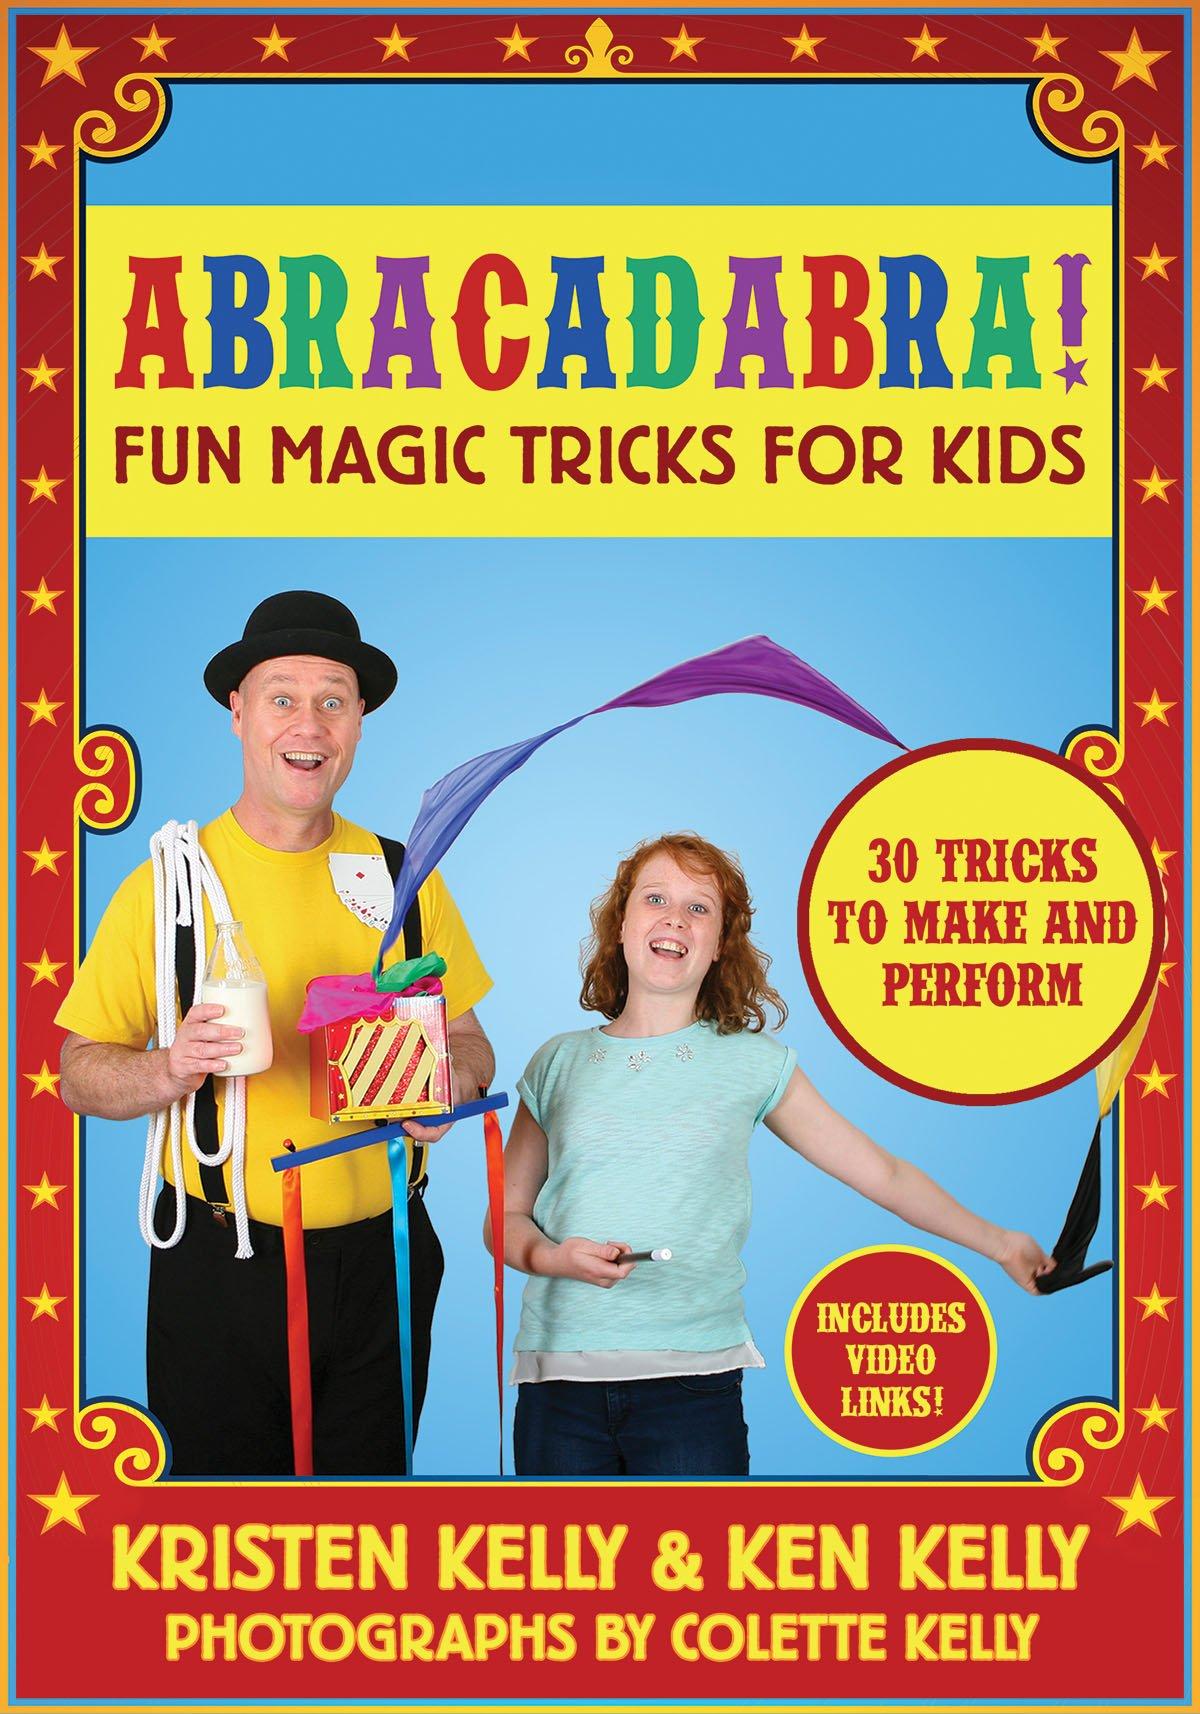 Amazon.com: Abracadabra!: Fun Magic Tricks for Kids - 30 tricks to ...